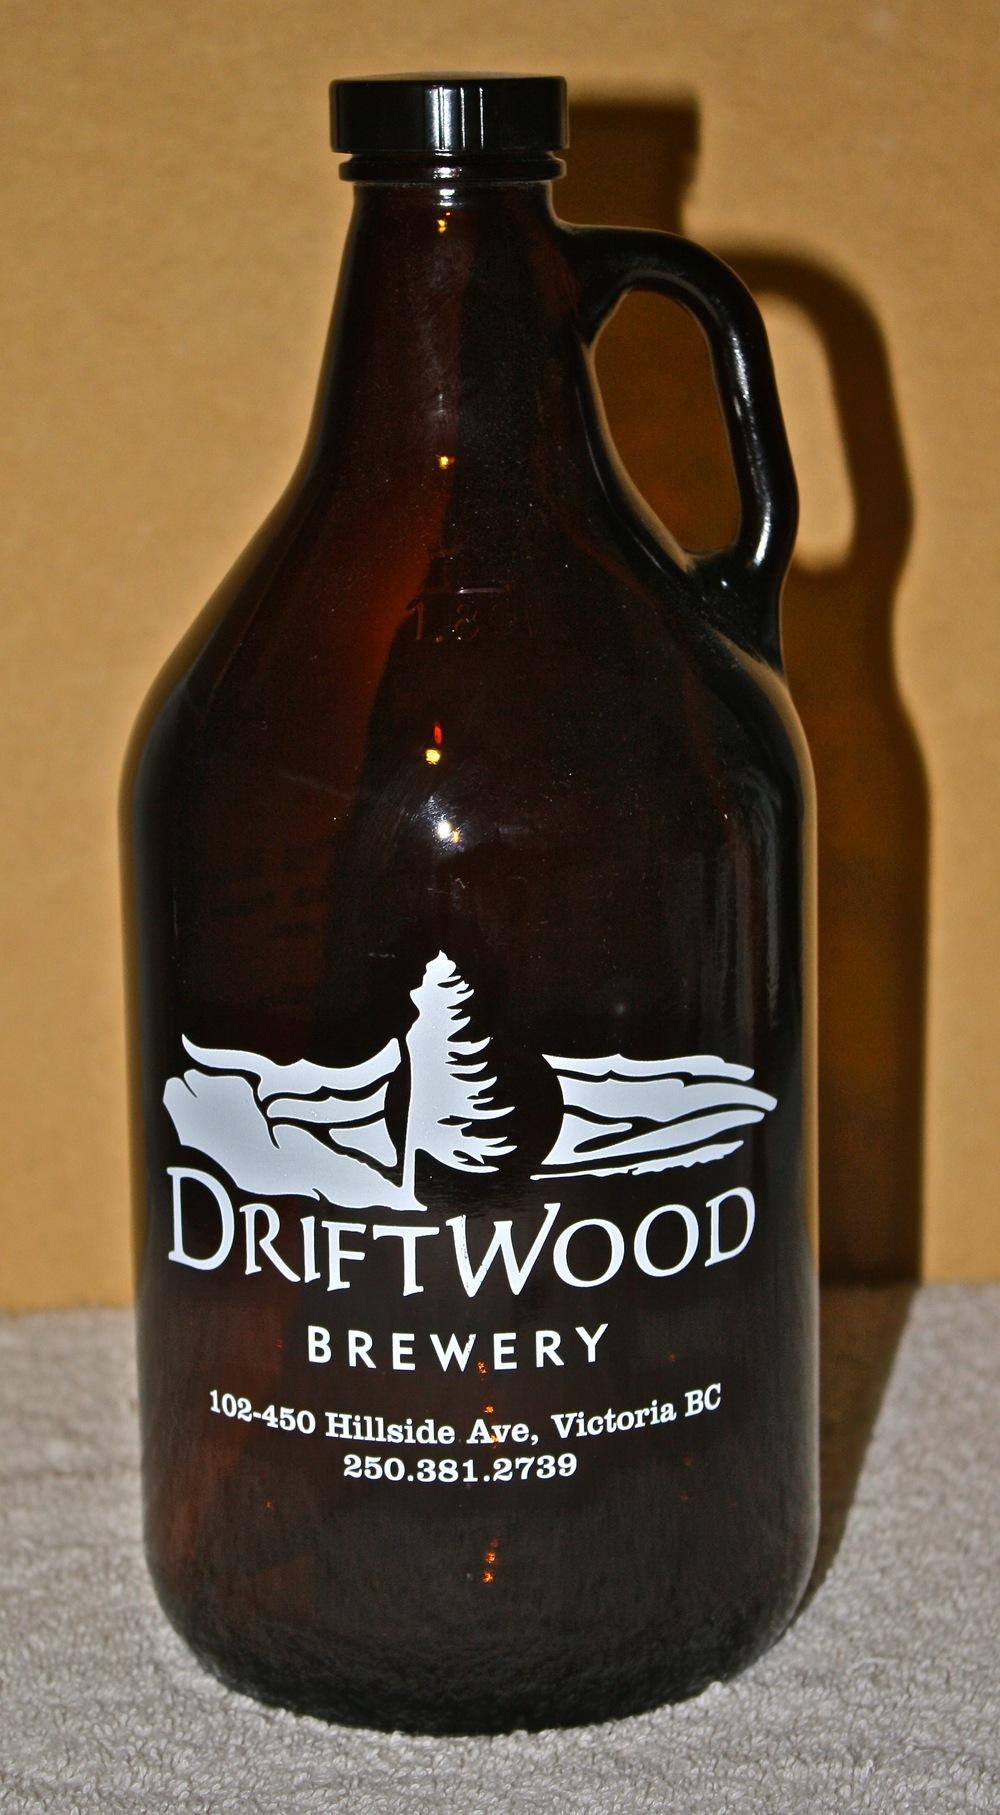 GR - Driftwood Brewery (BC).jpg